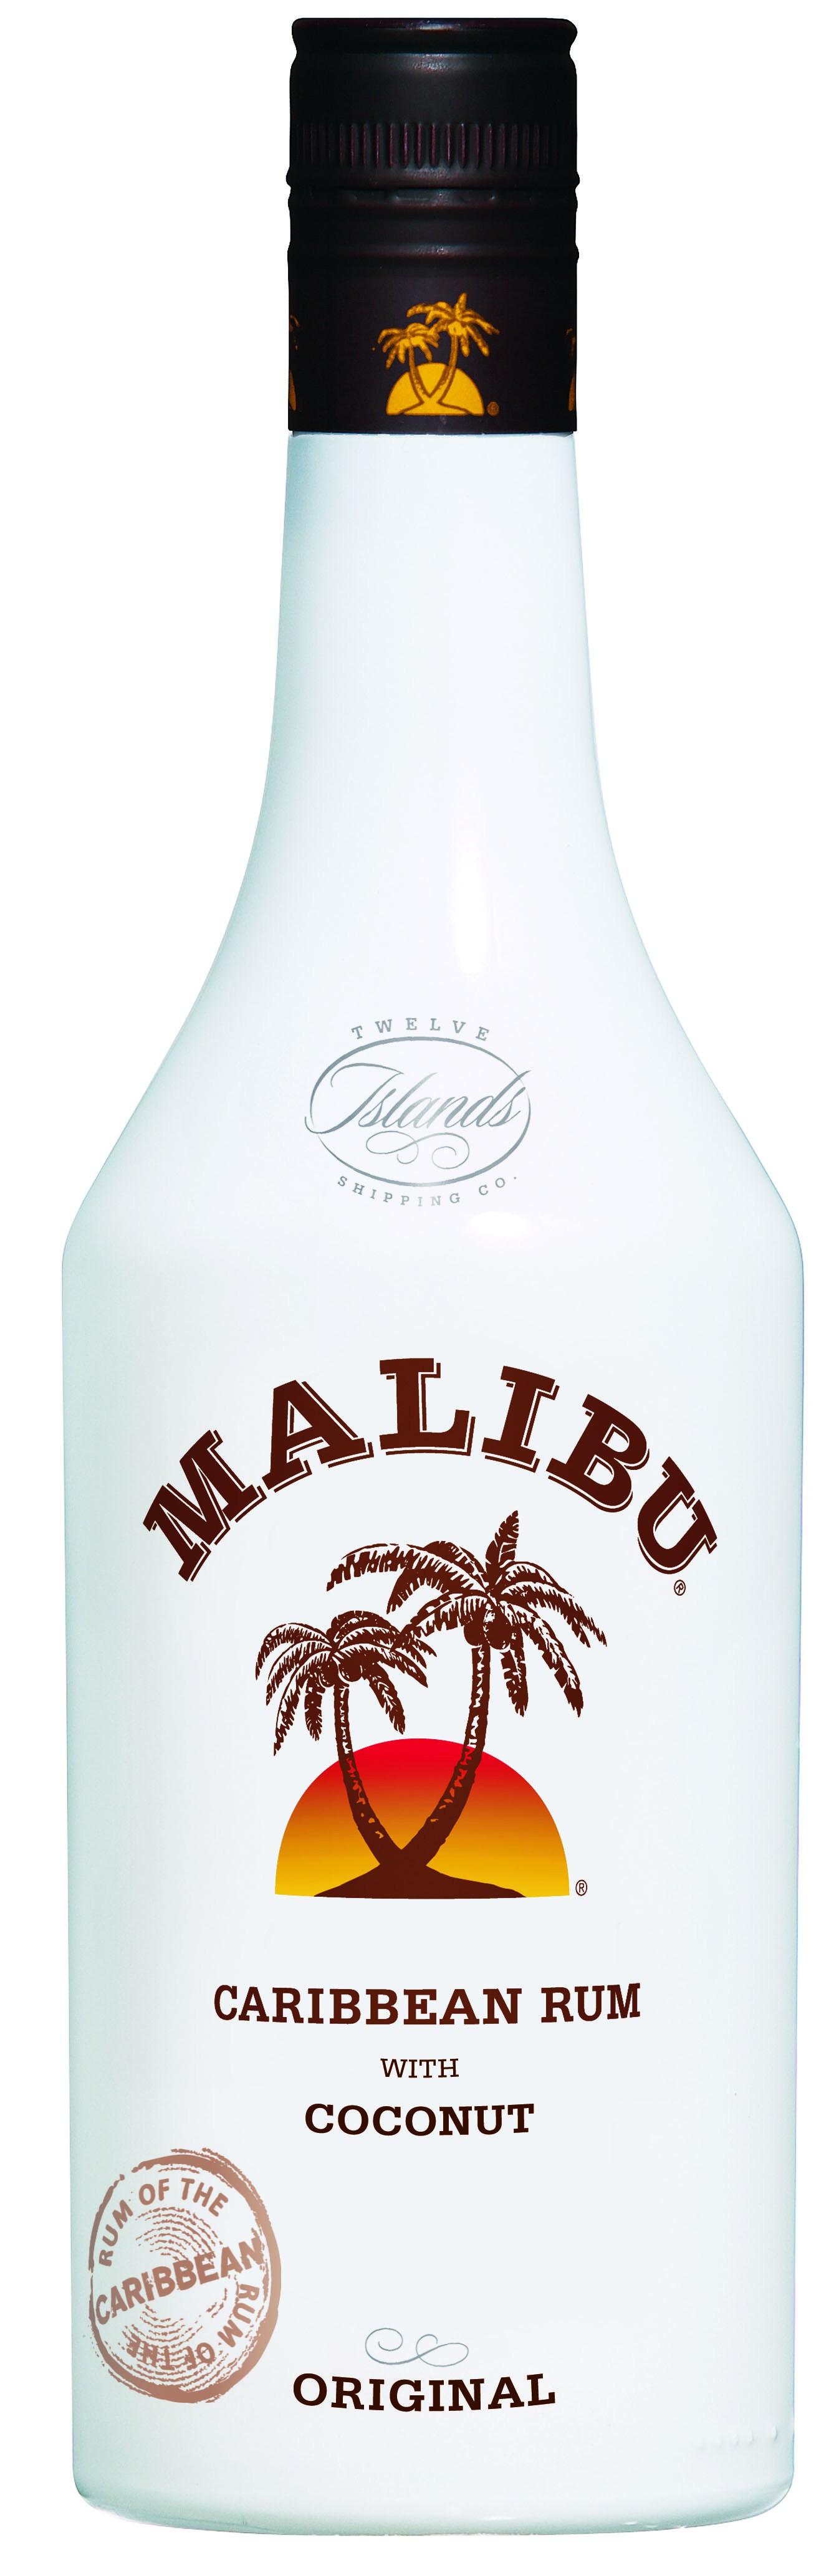 Bouteille De Malibu Coconut 150 Cl 21 176